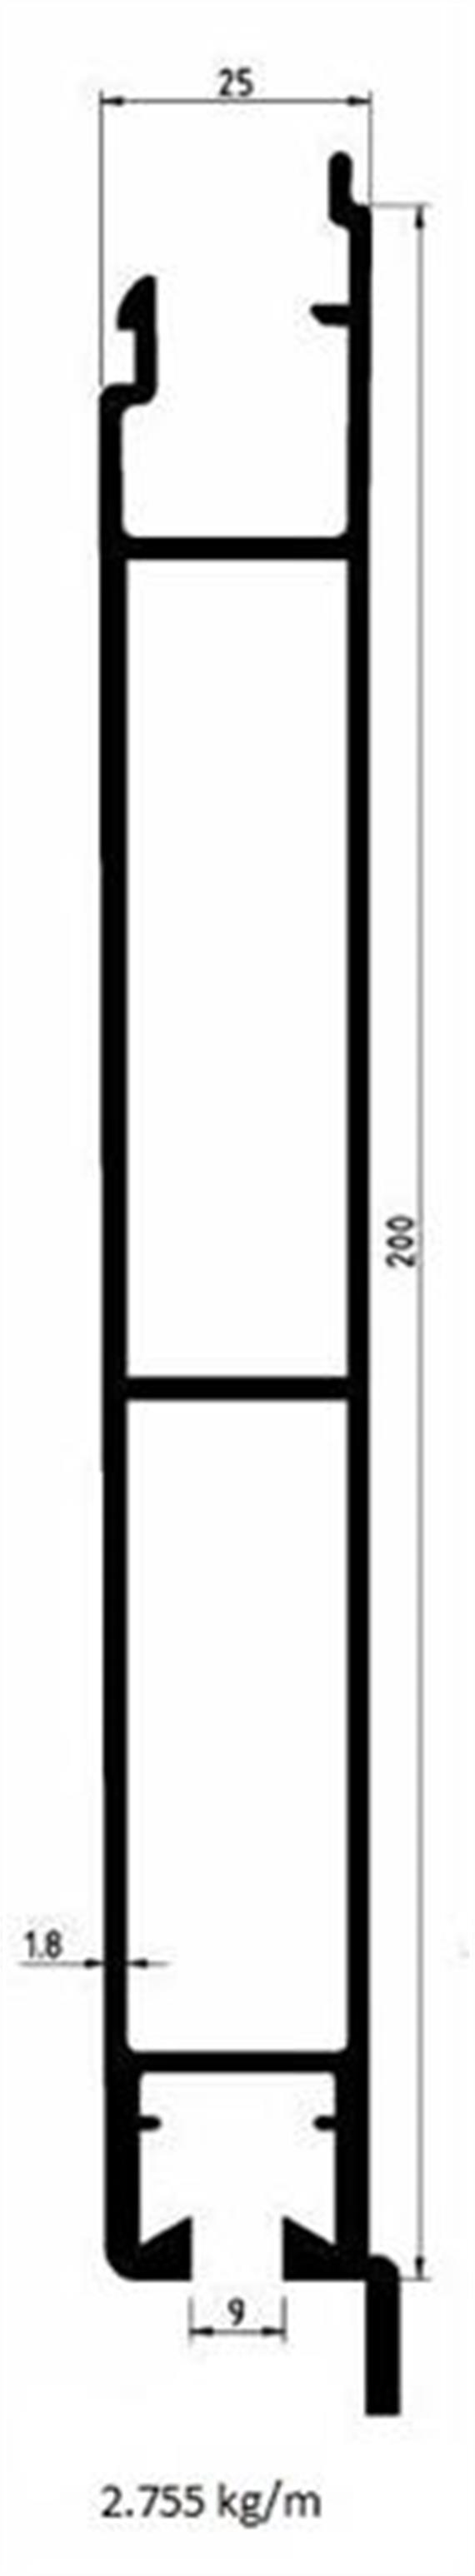 Bordwand unten 25 x 200 elox L=6100mm